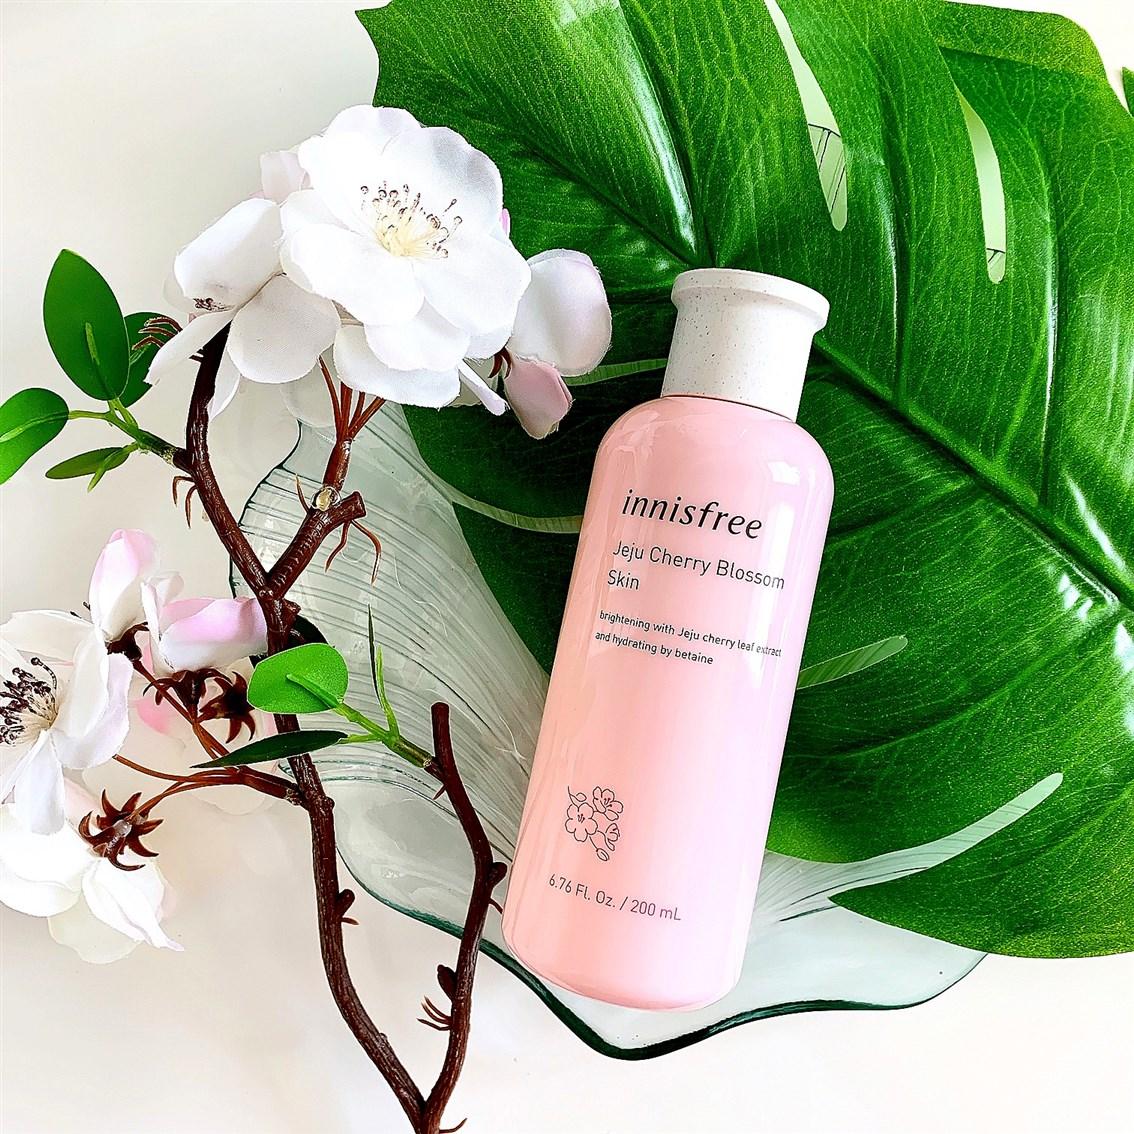 Innisfree Jeju Cherry Blossom Skin toner